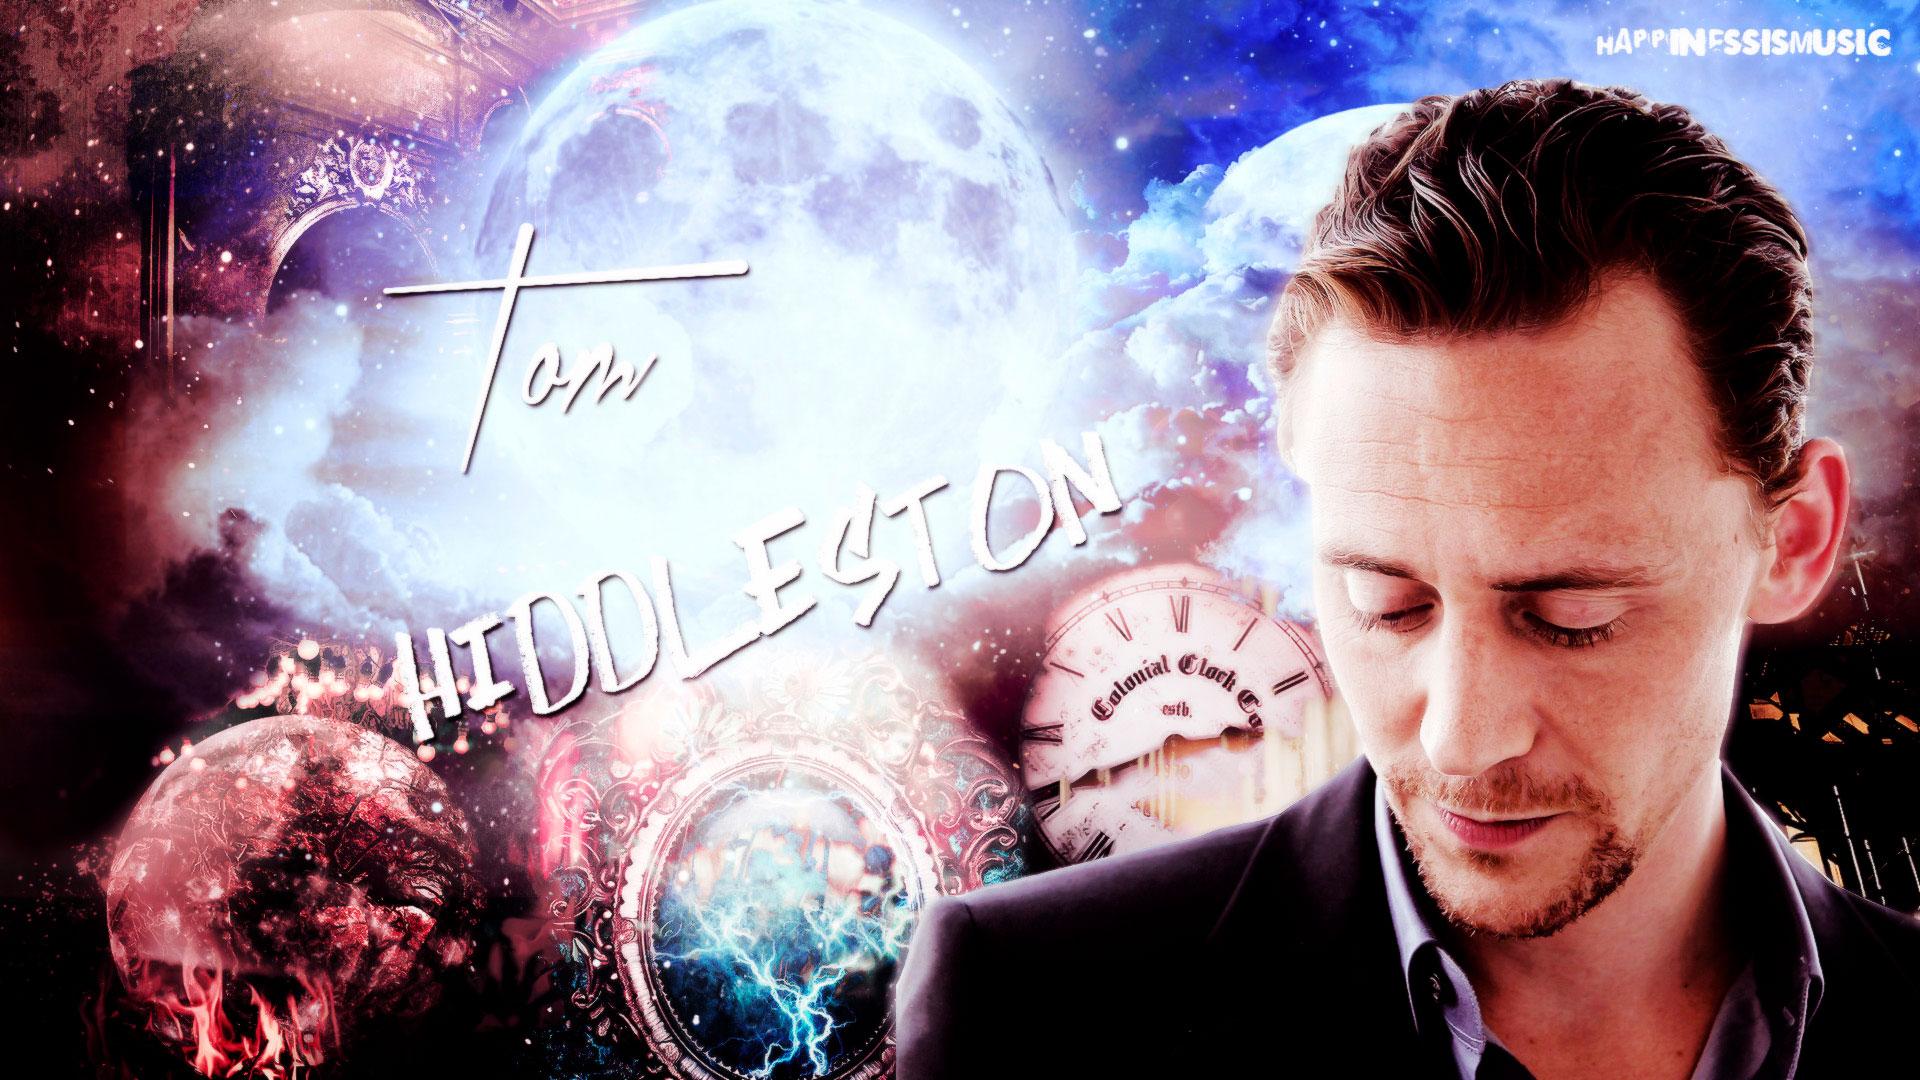 Wallpapers   Tom Hiddleston 2015 wallpaper 1920x1080